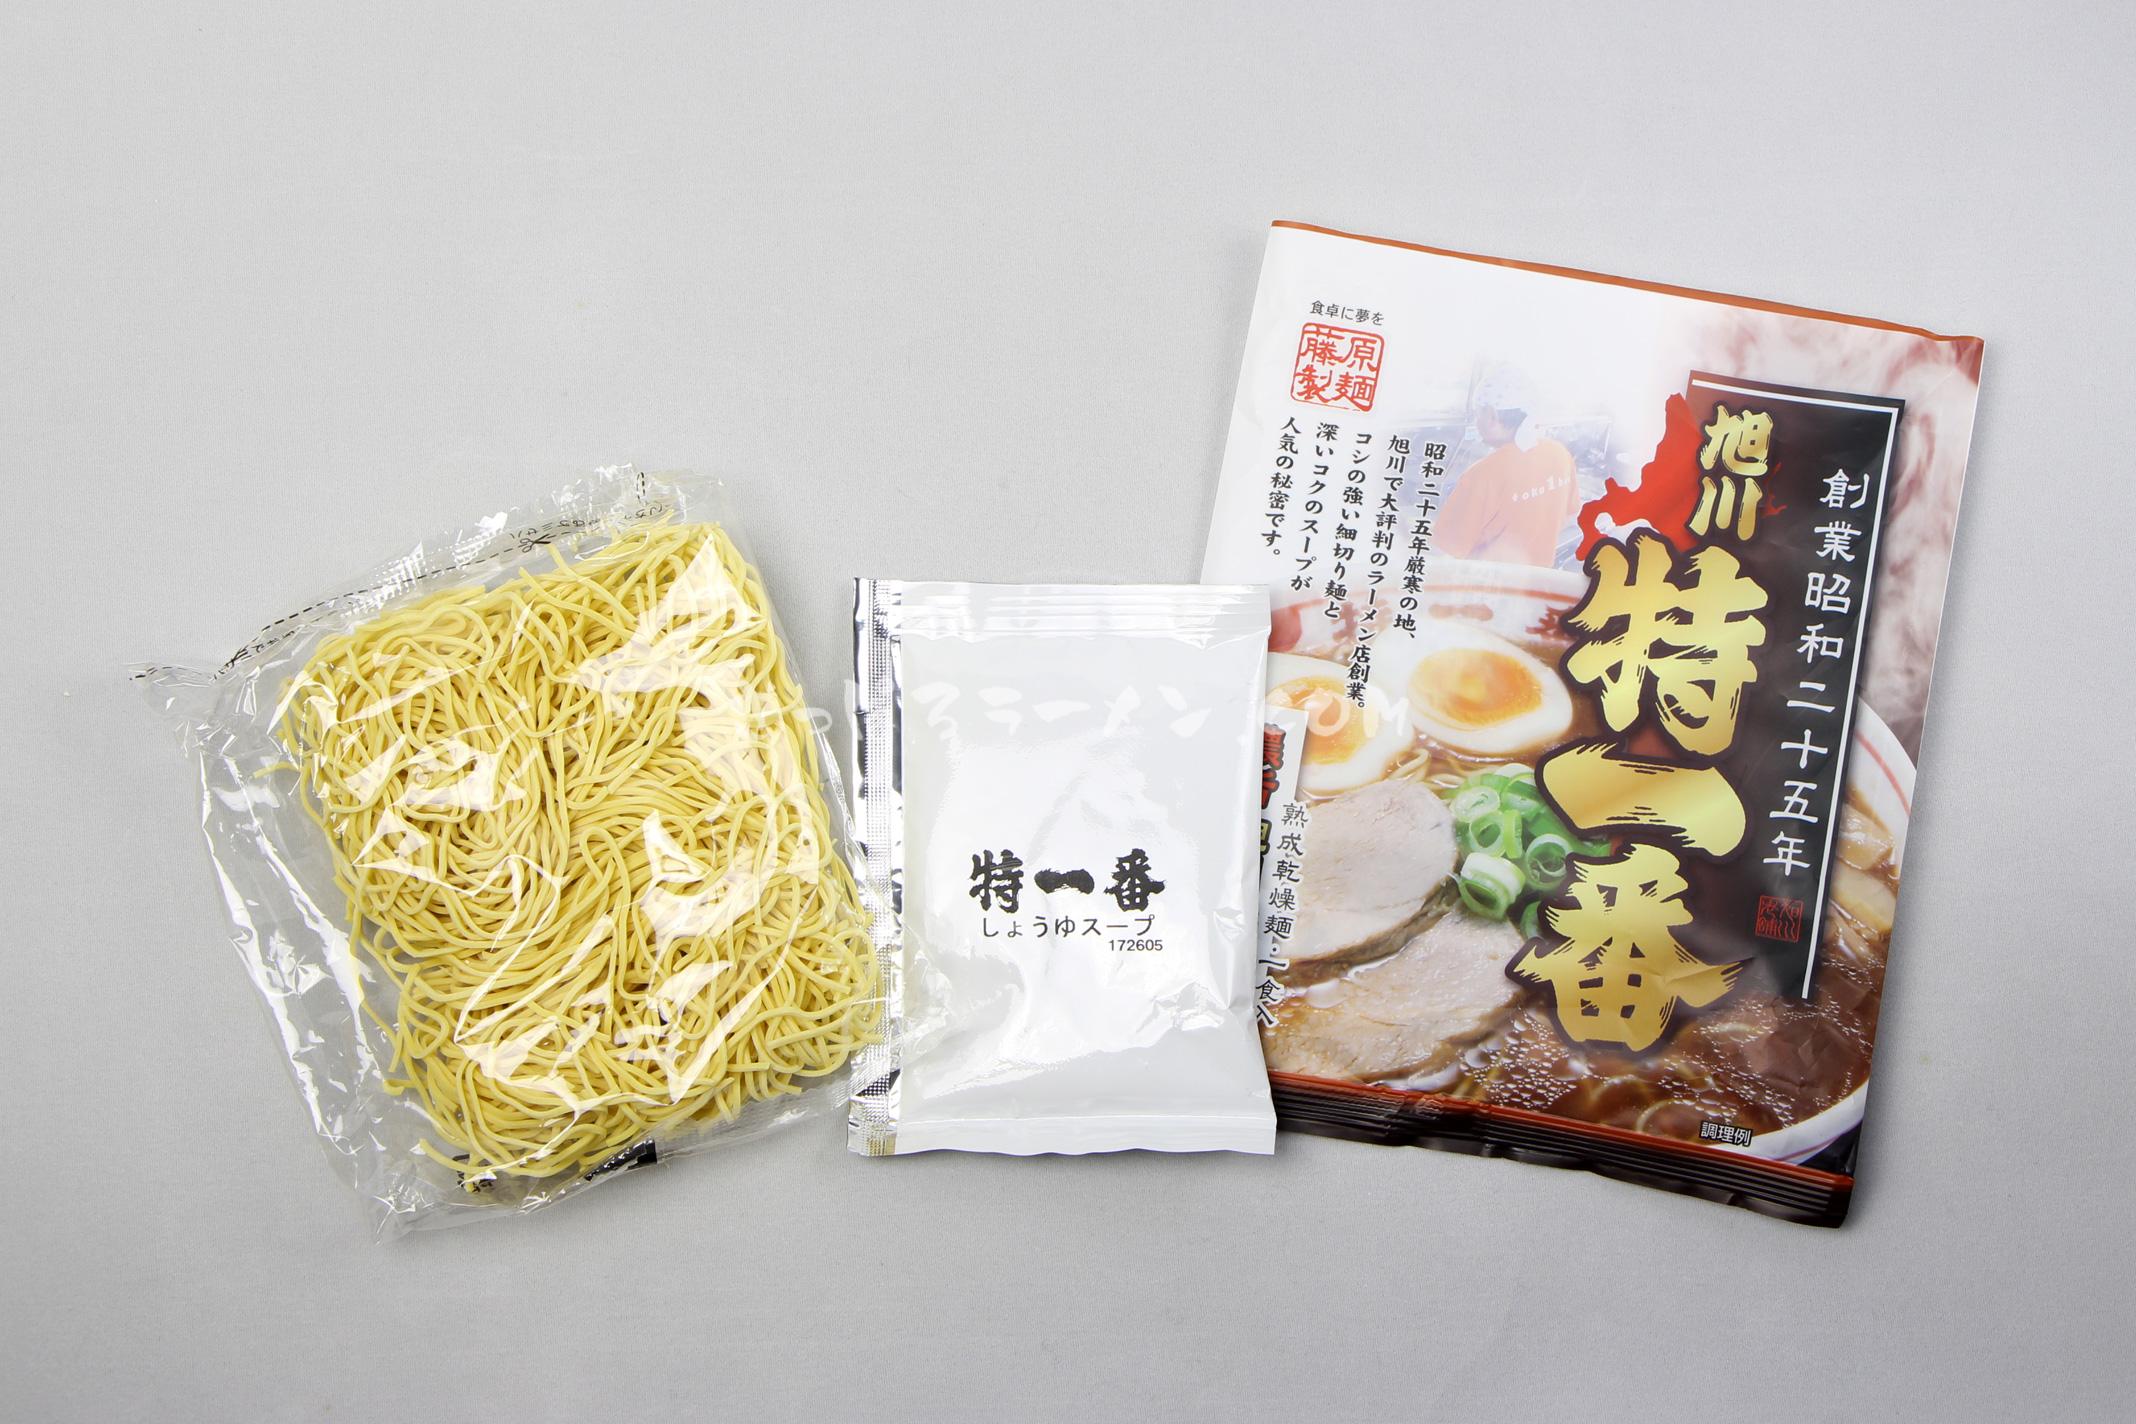 「旭川特一番 濃旨旭川醤油味」(藤原製麺)の麺とスープ